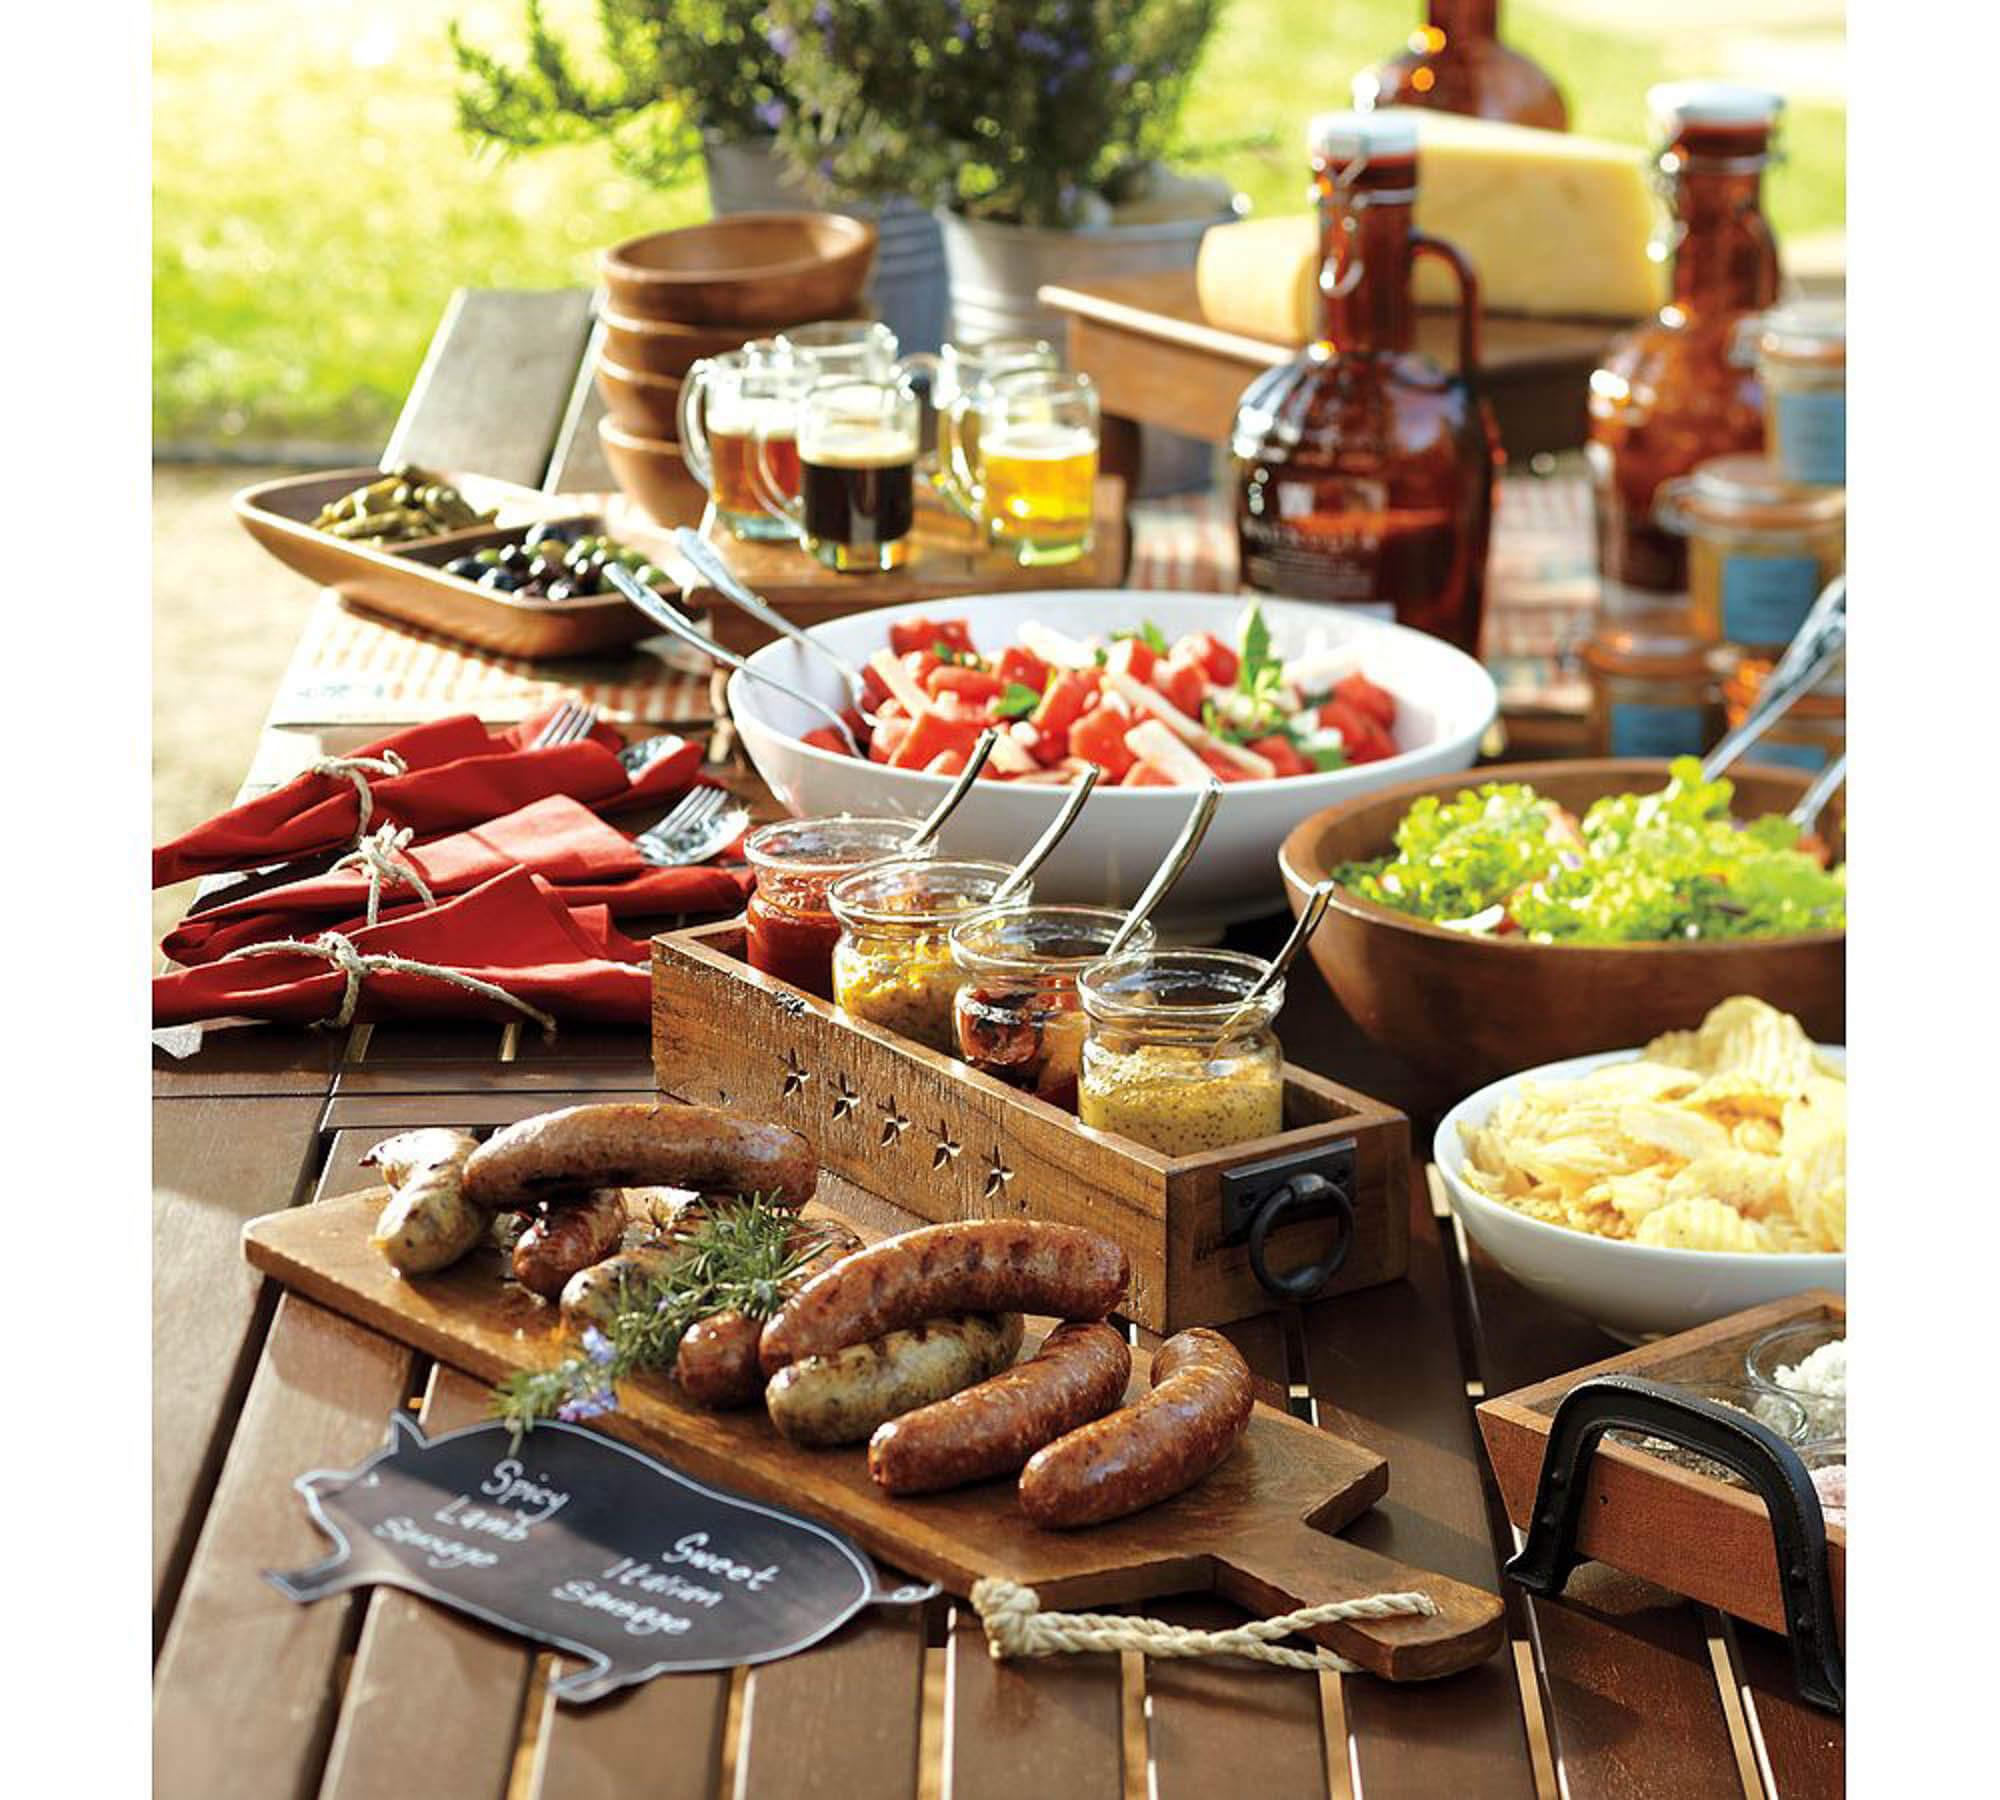 Backyard Bbq Party Ideas  How to Host a Backyard Party & BBQ — Gentleman s Gazette